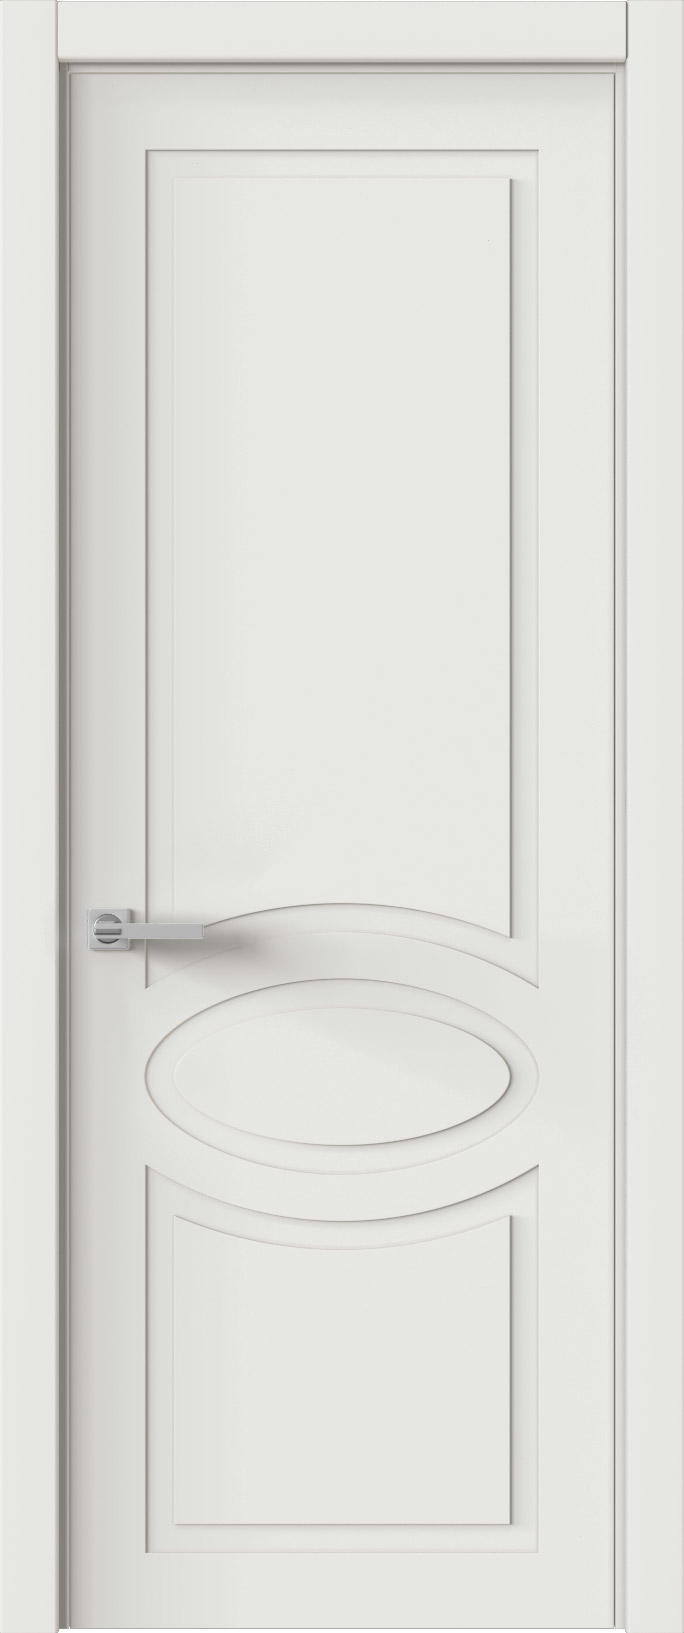 Tivoli Н-5 цвет - Белая эмаль (RAL 9003) Без стекла (ДГ)